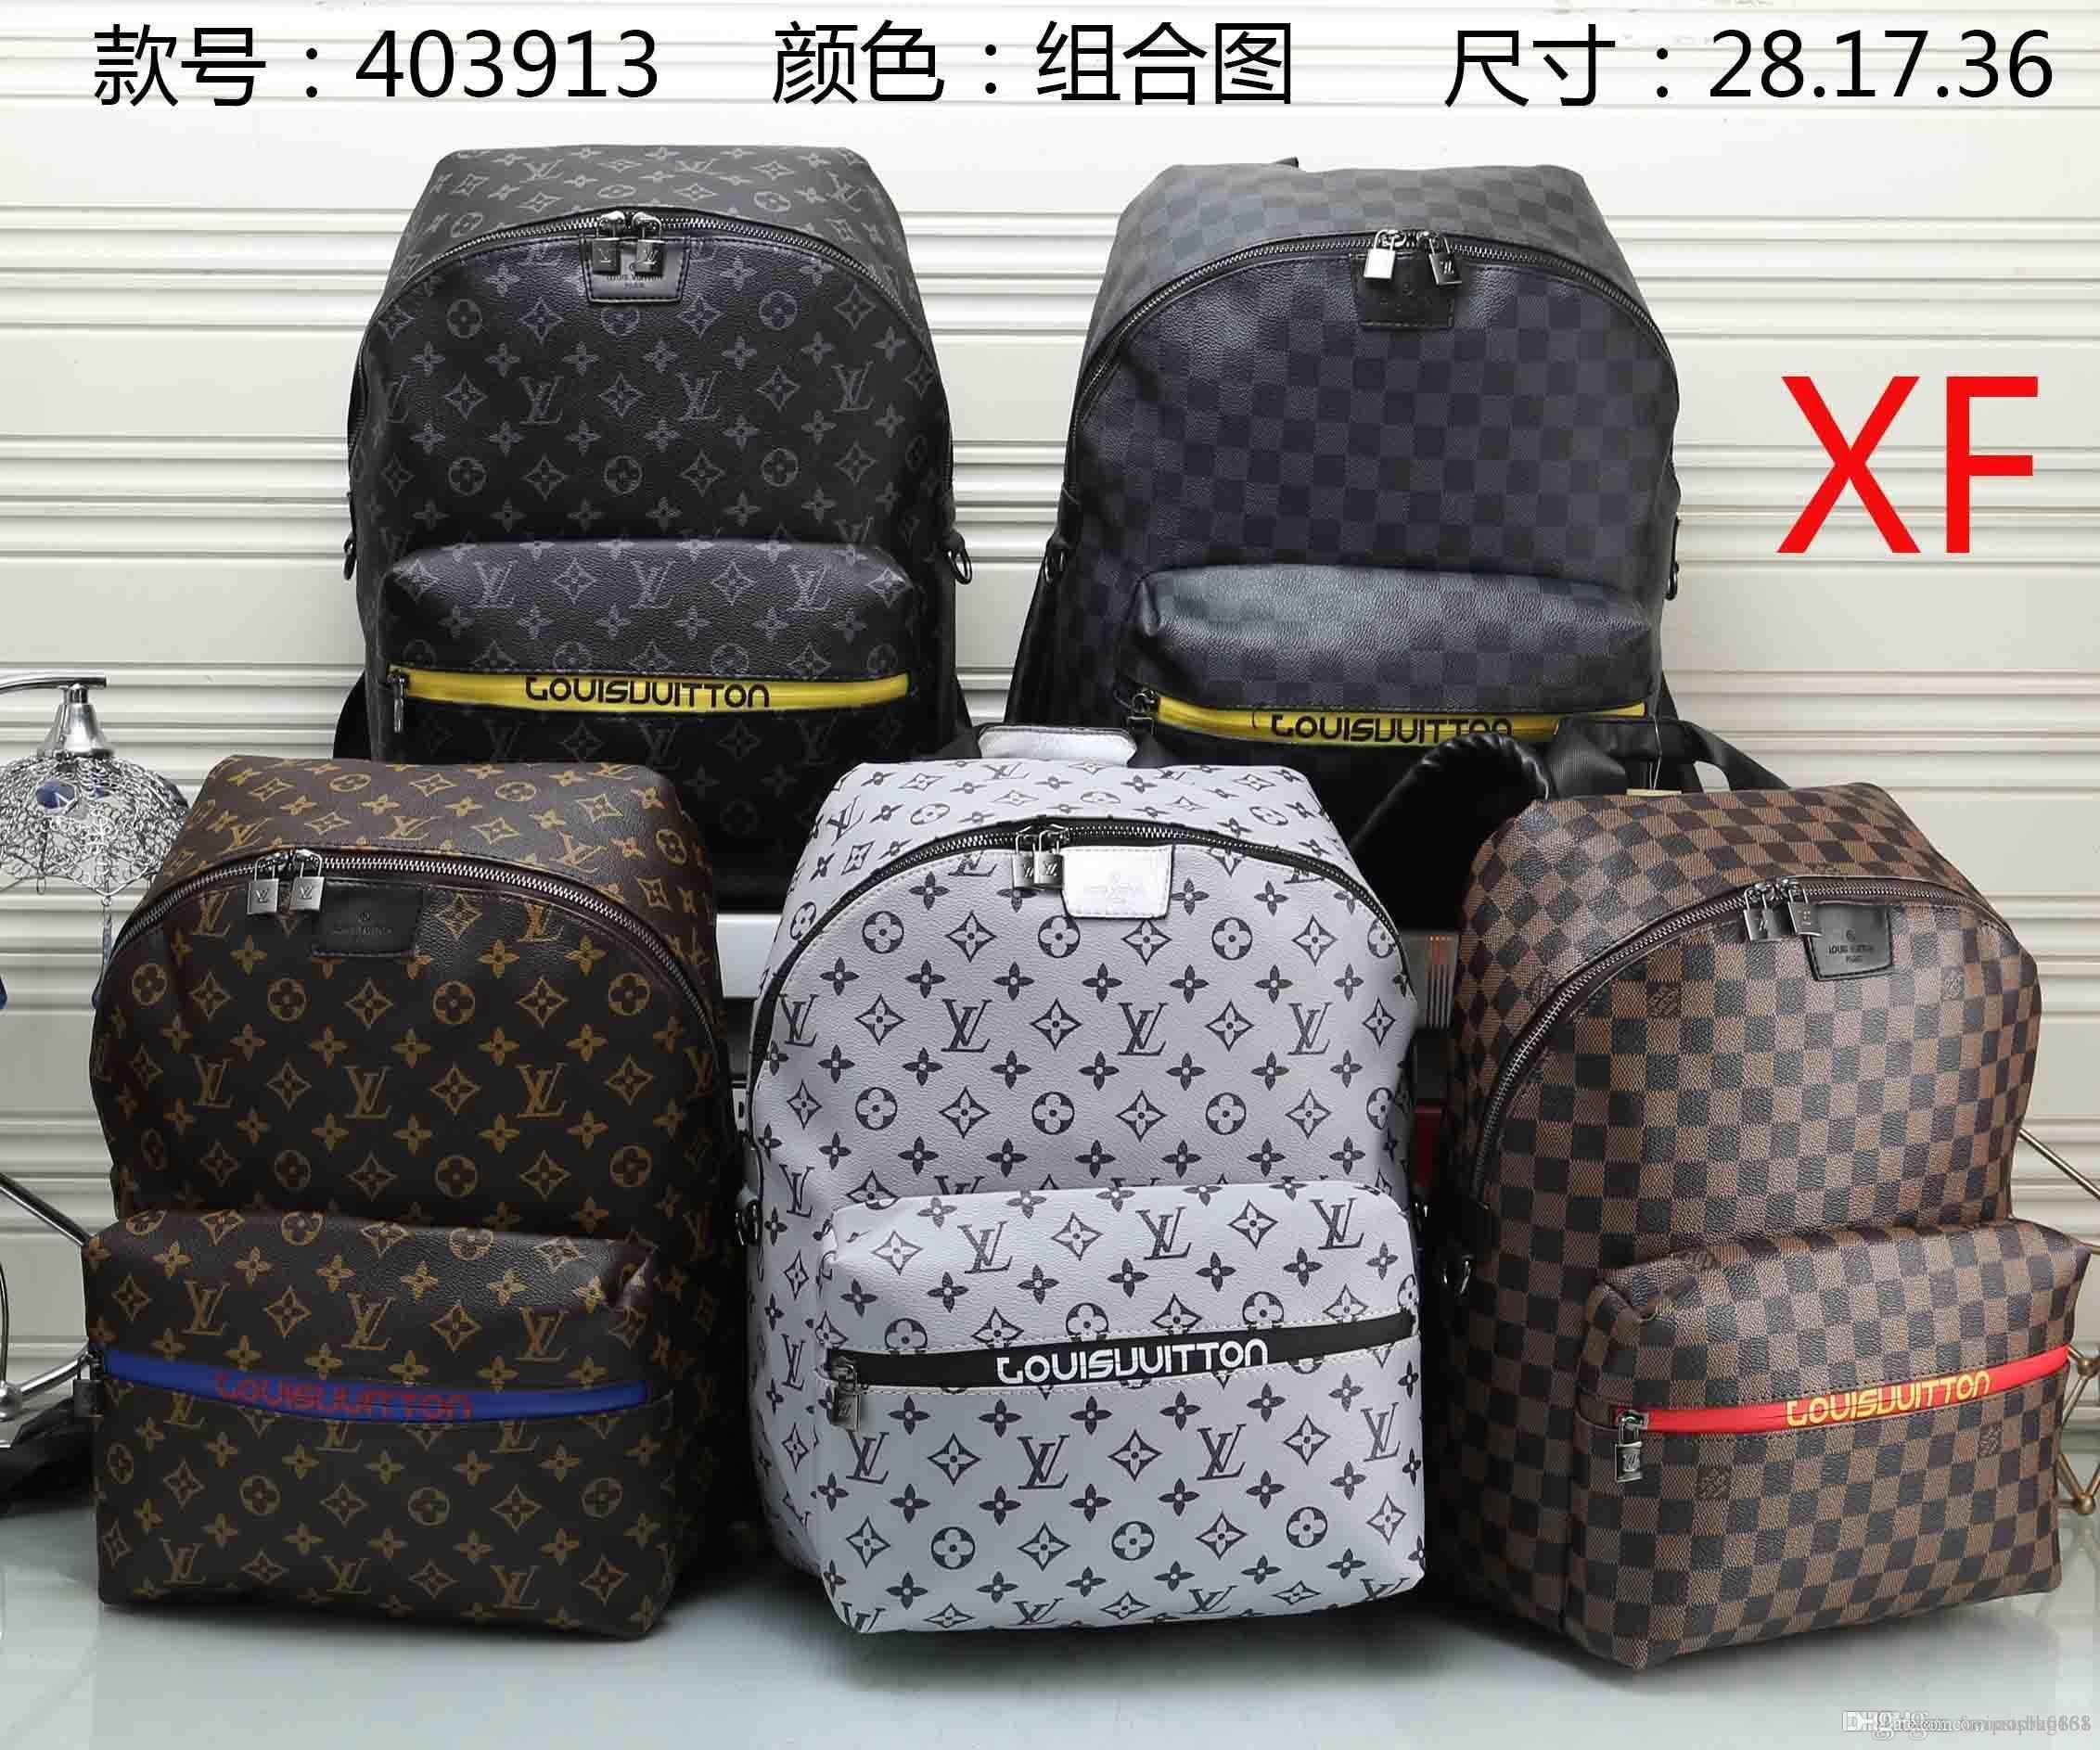 2018 NEW Styles Fashion Bags Ladies Handbag Designer Bags Women Tote Bag  Luxury Brand Bags Single Shoulder Crossbody Bag Backpack MK 403913 Women  Tote Women ... 379b9e9d1a